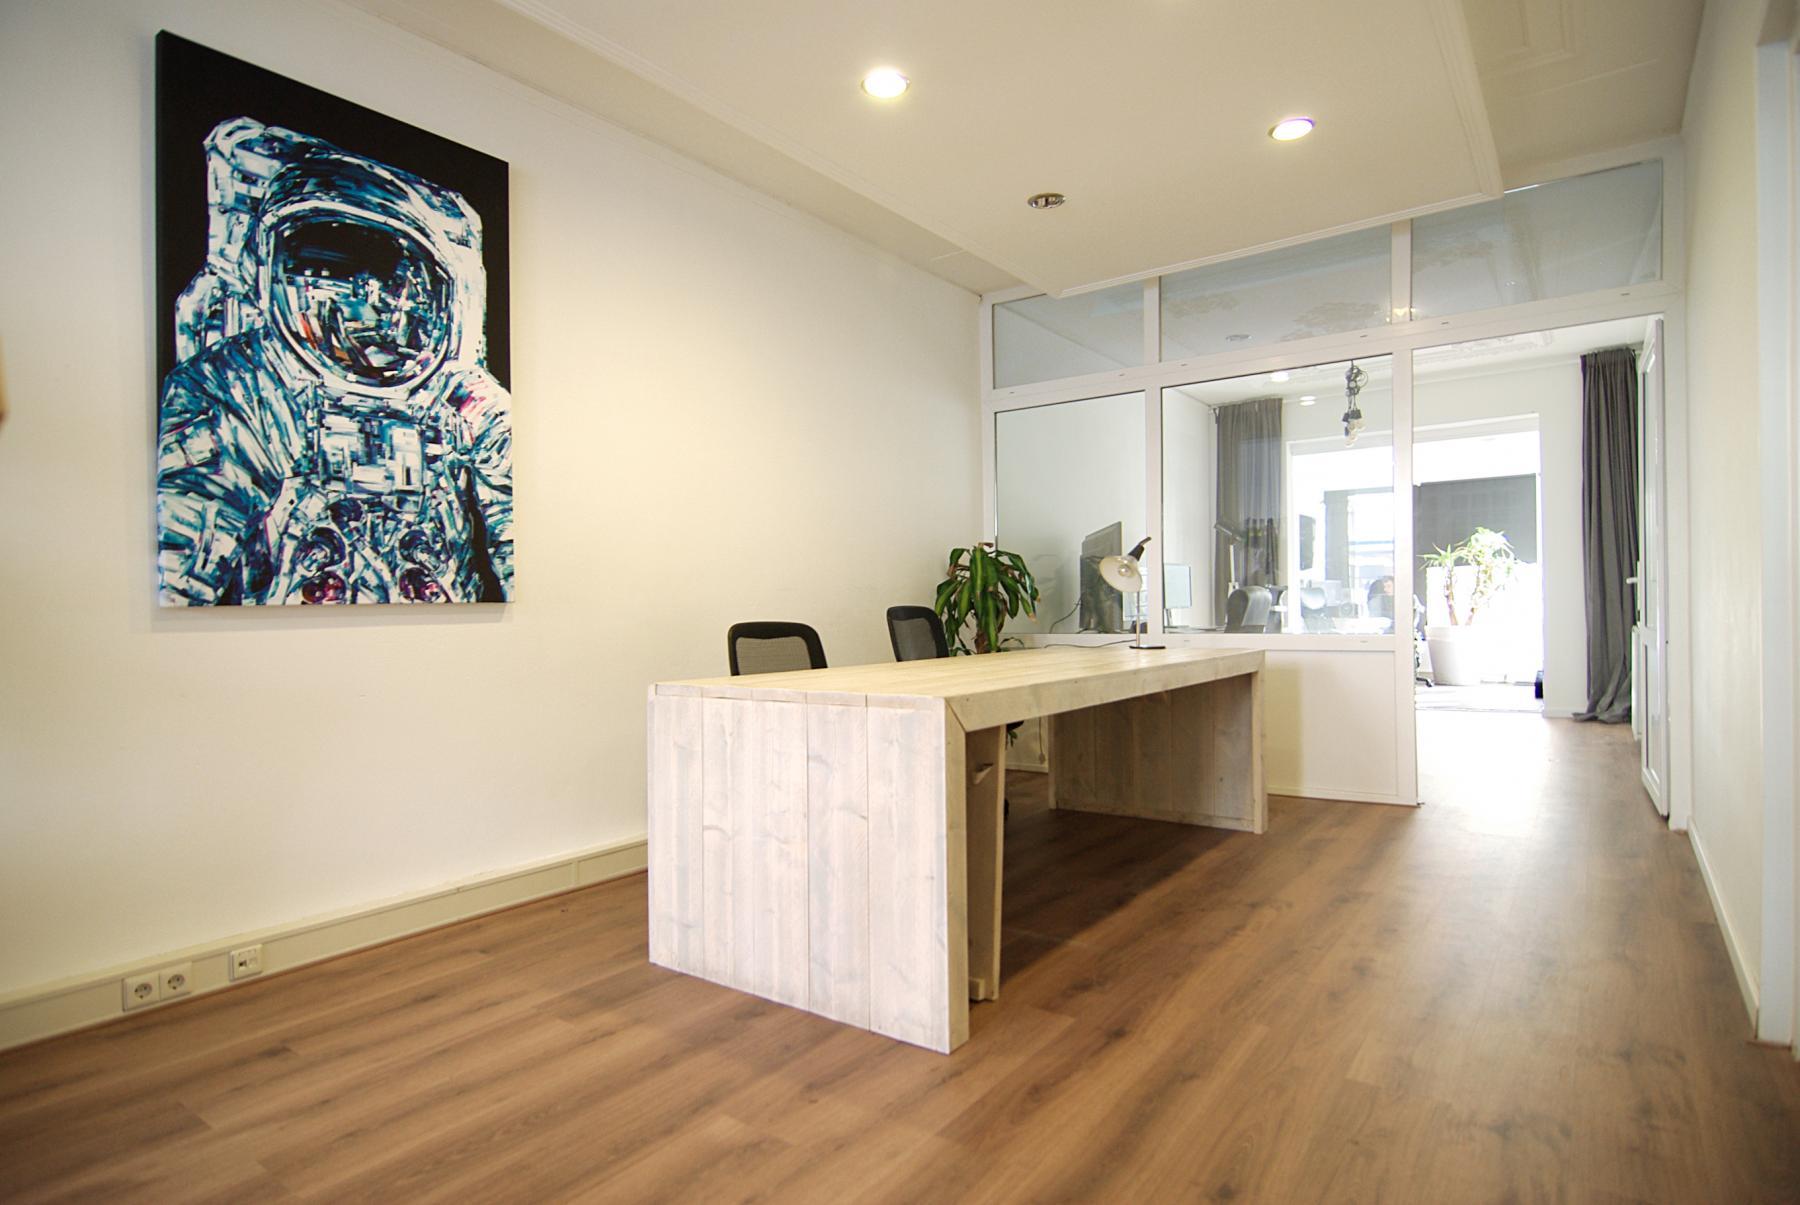 Rent office space Ceintuurbaan 222, Amsterdam (17)